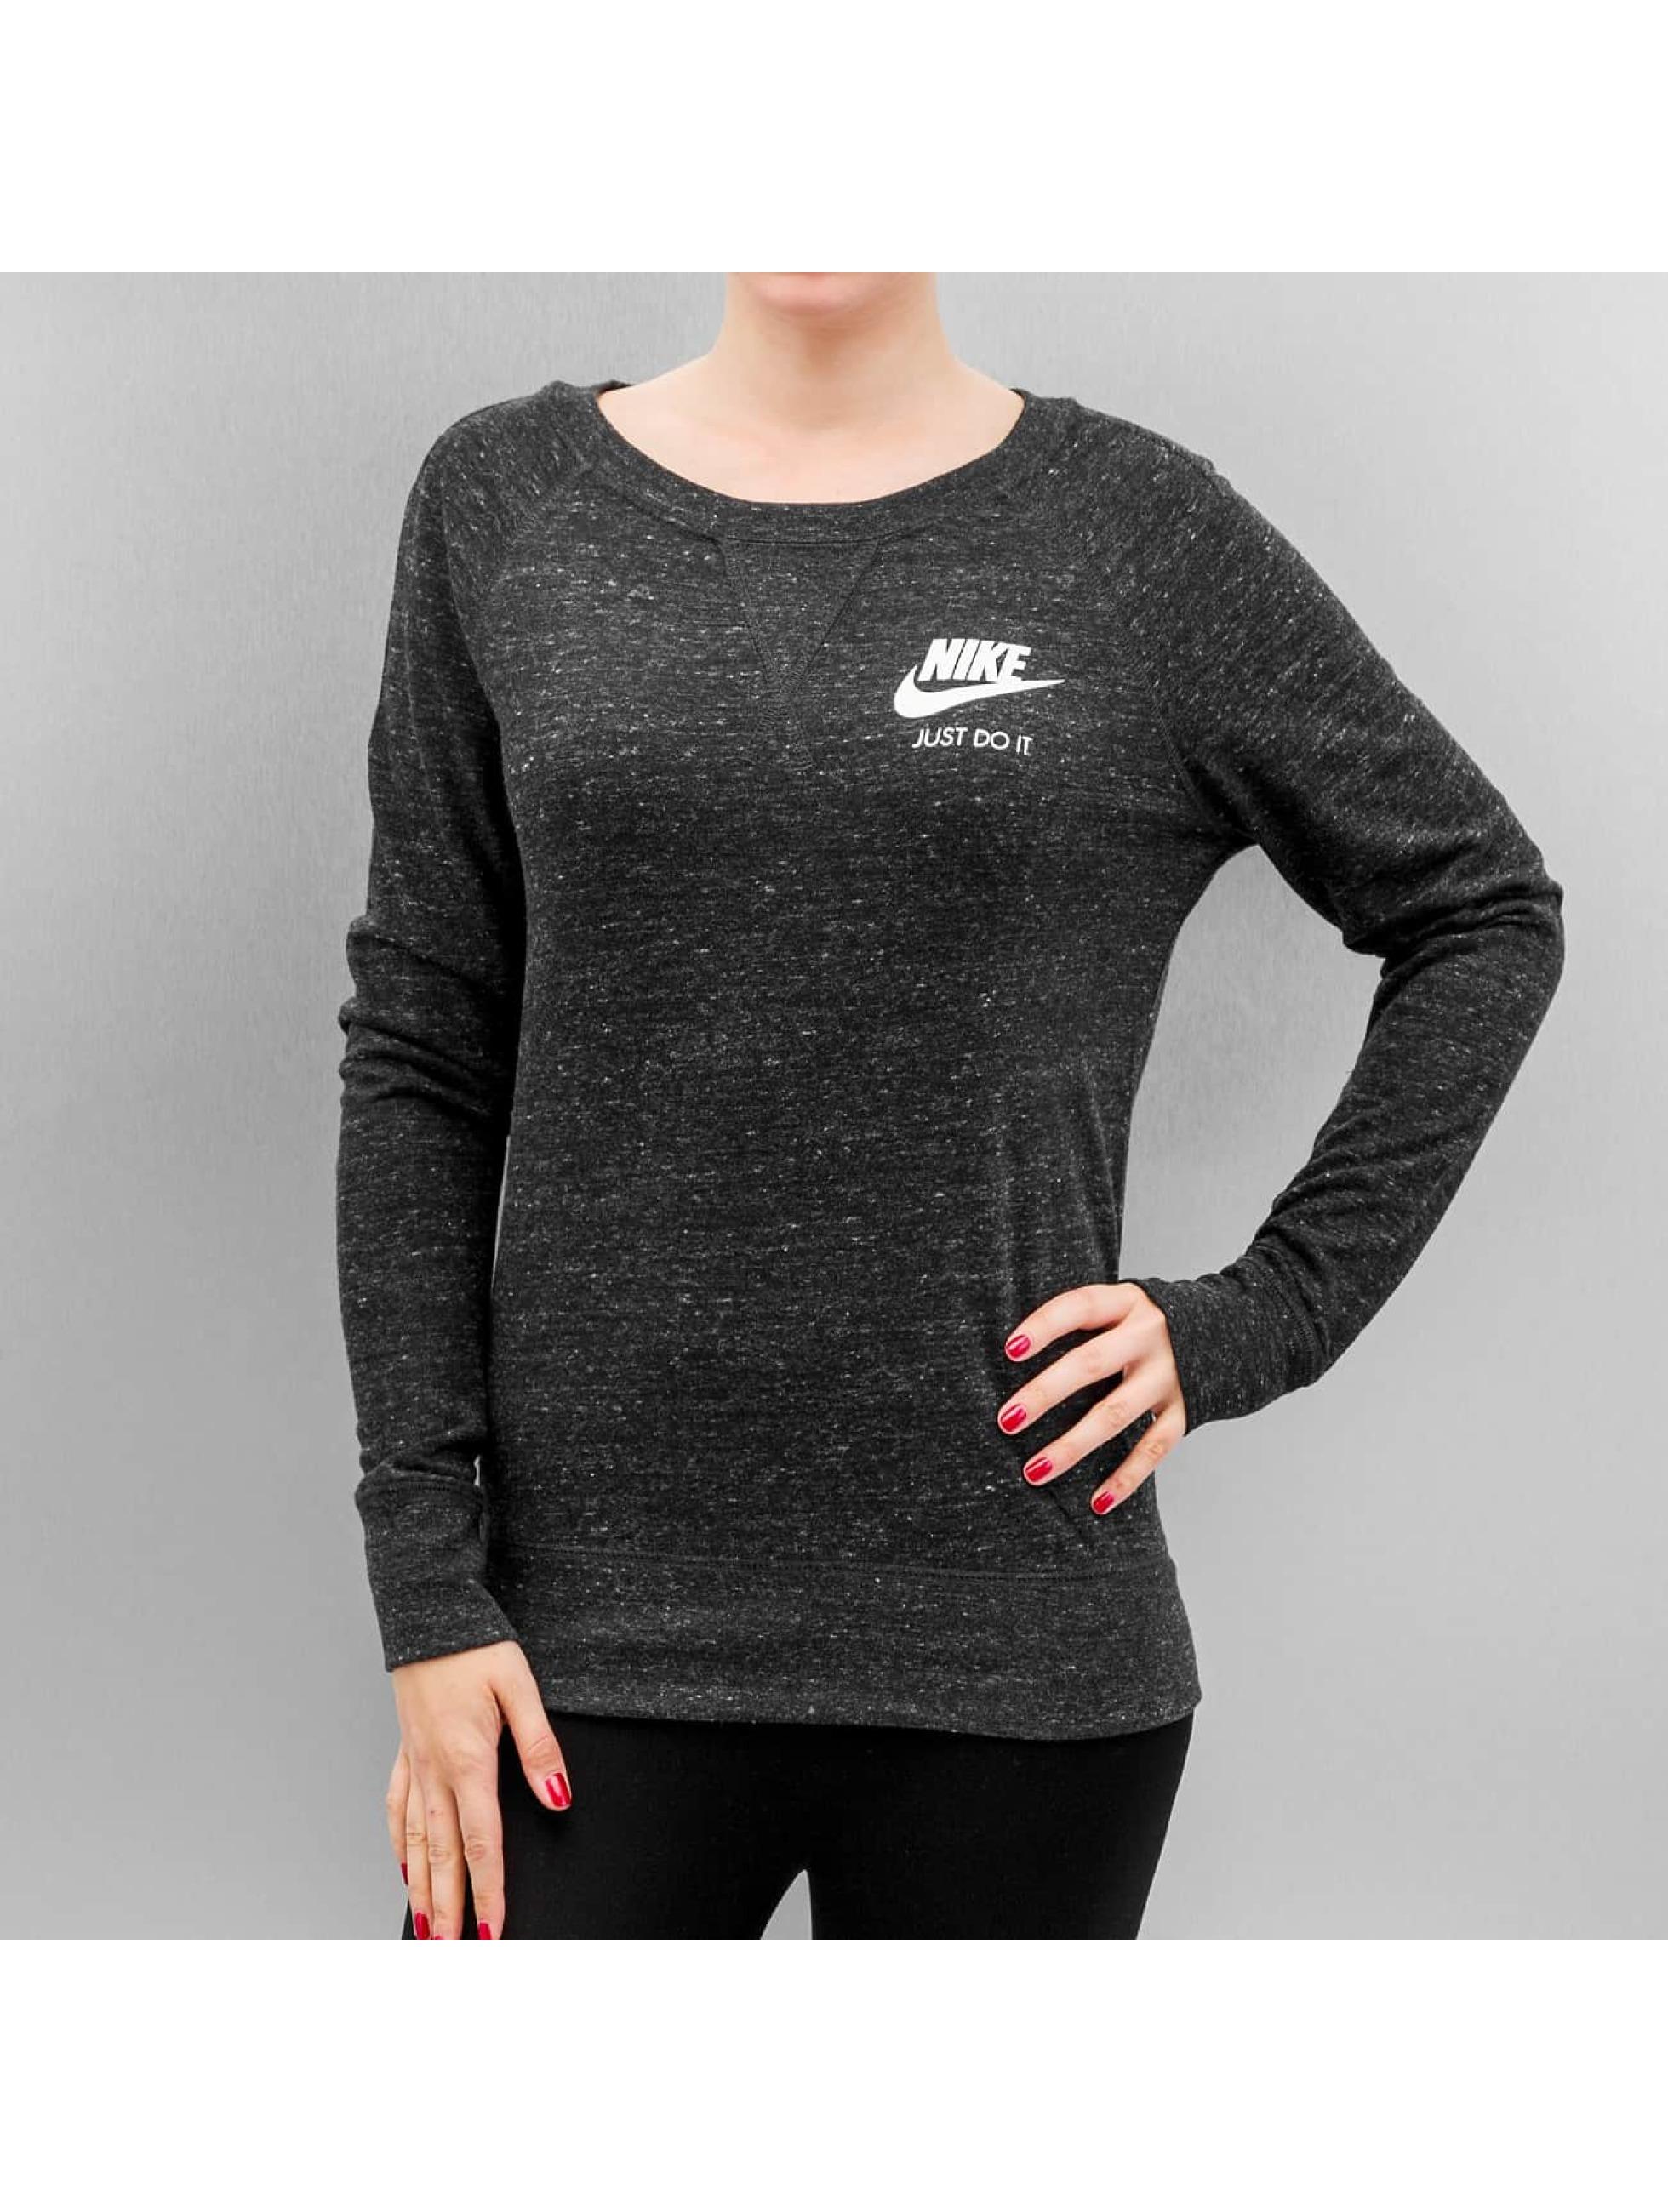 Nike Pullover Gym Vintage schwarz